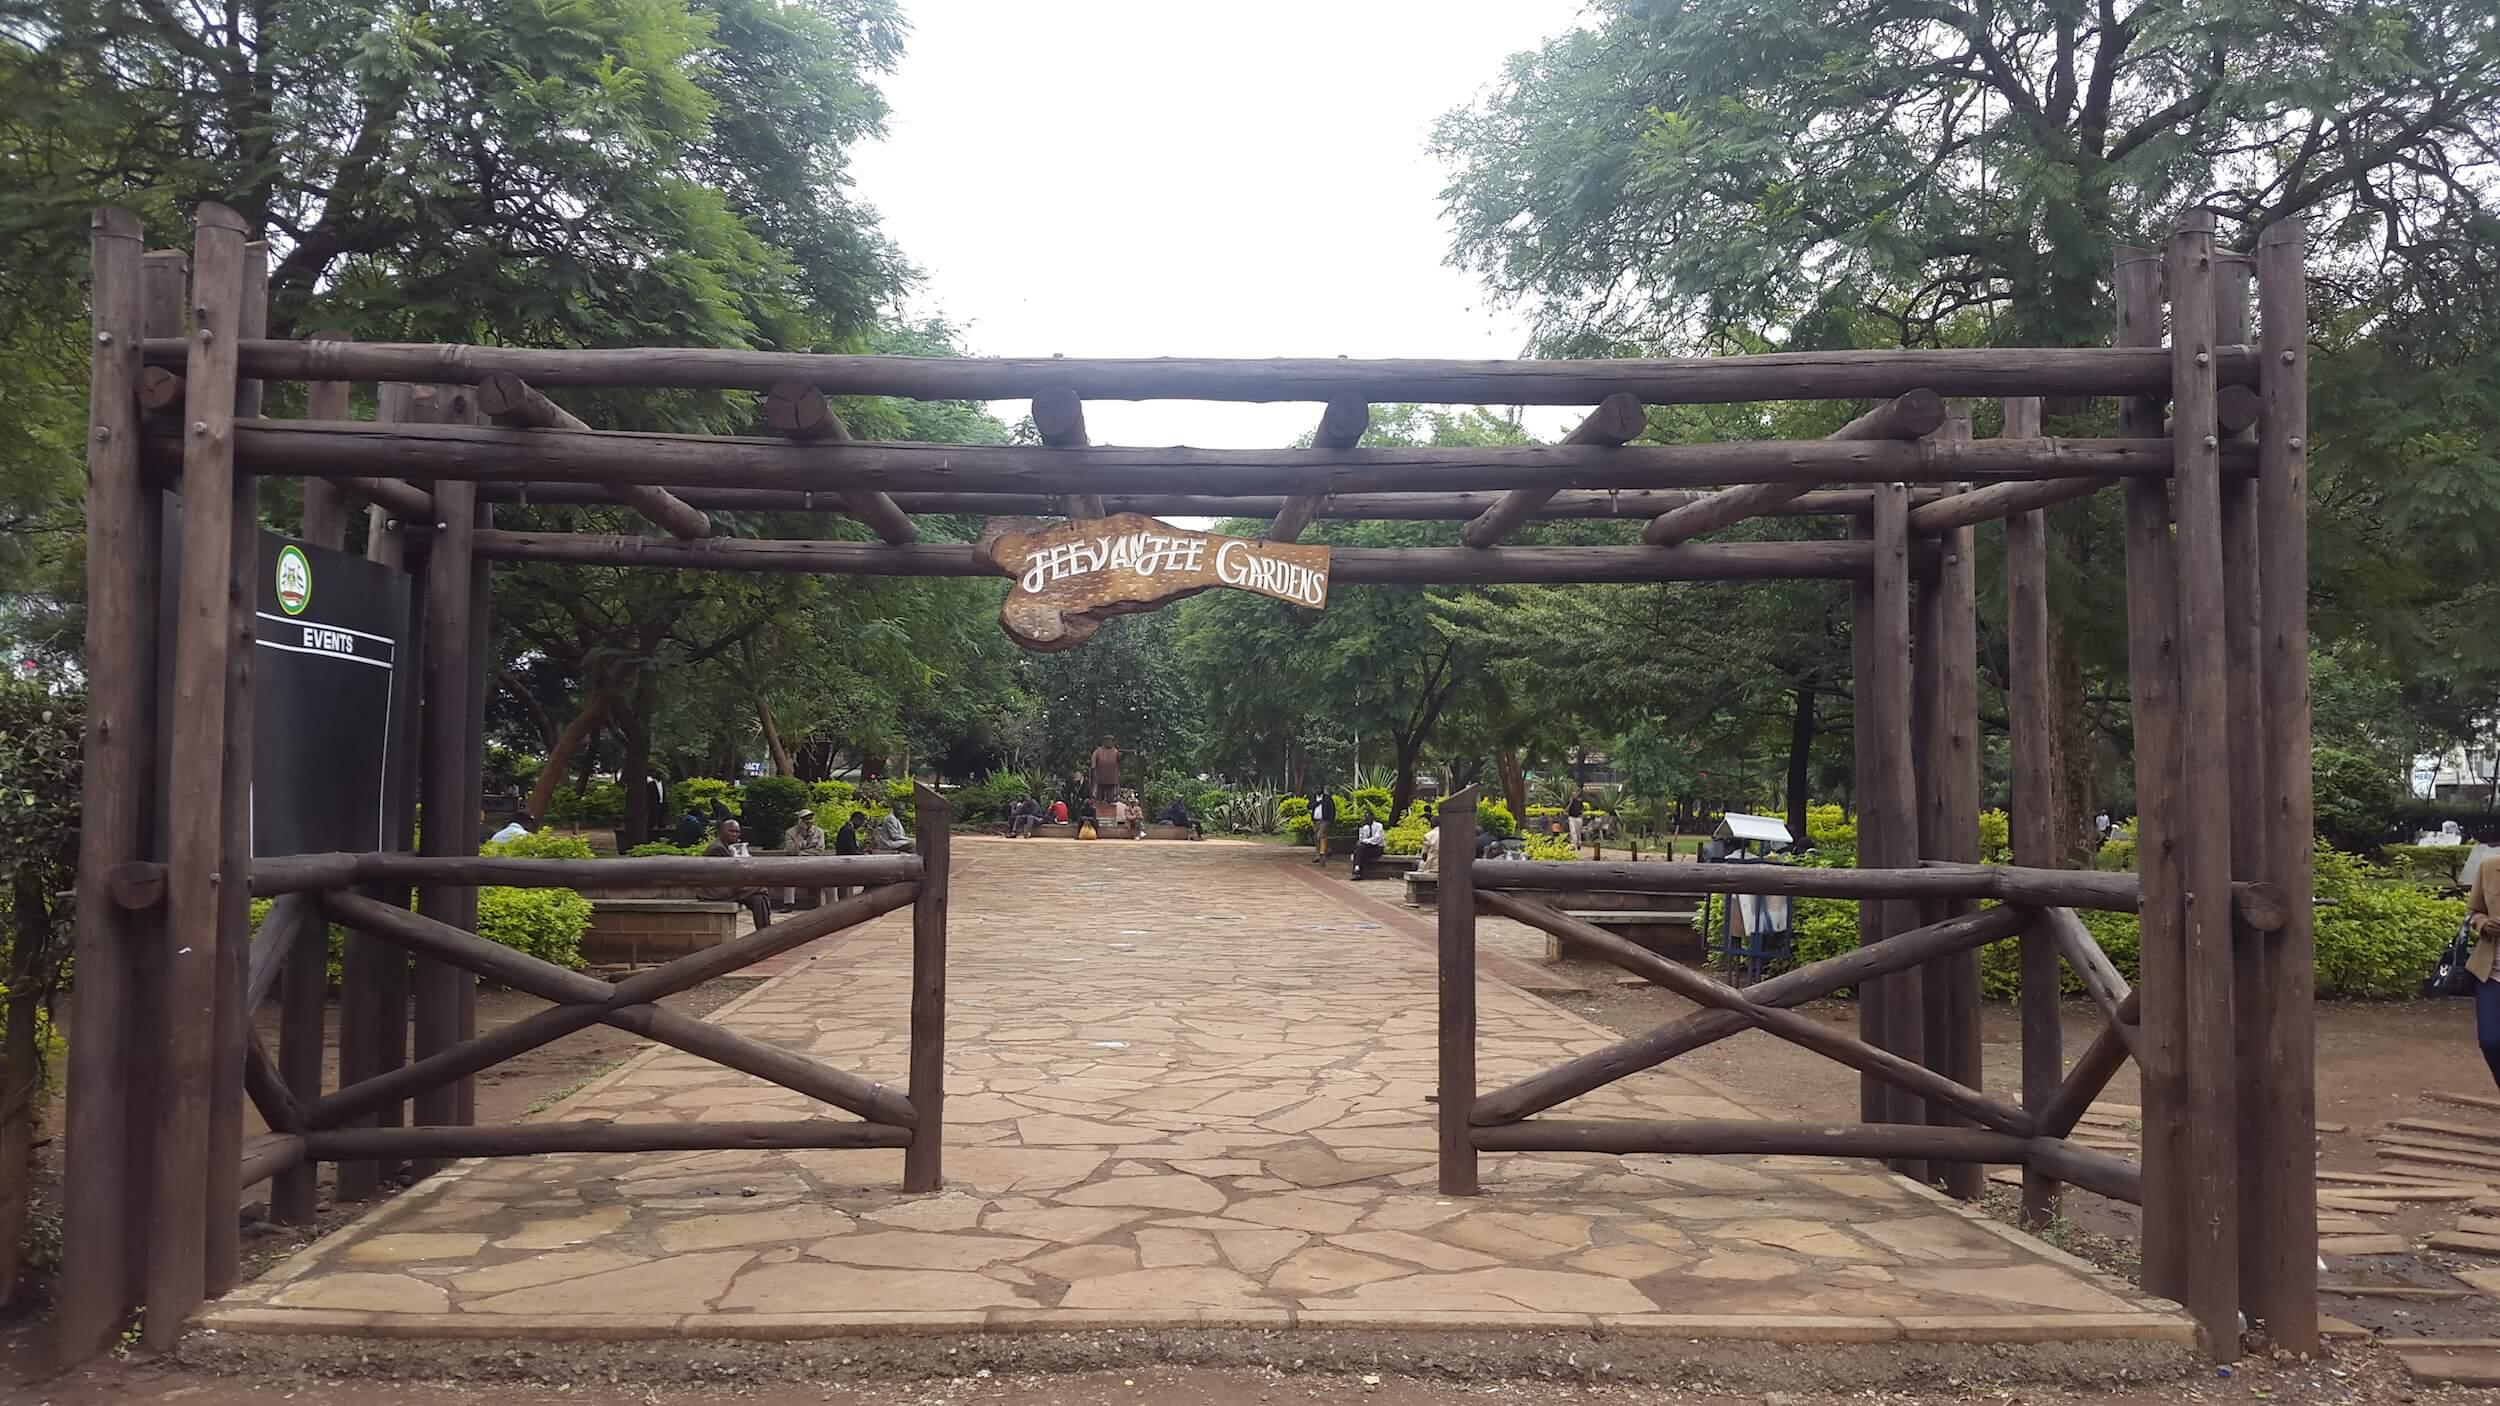 Completed Jeevanjee Gardens park, Nairobi, Kenya Credit: UN-Habitat